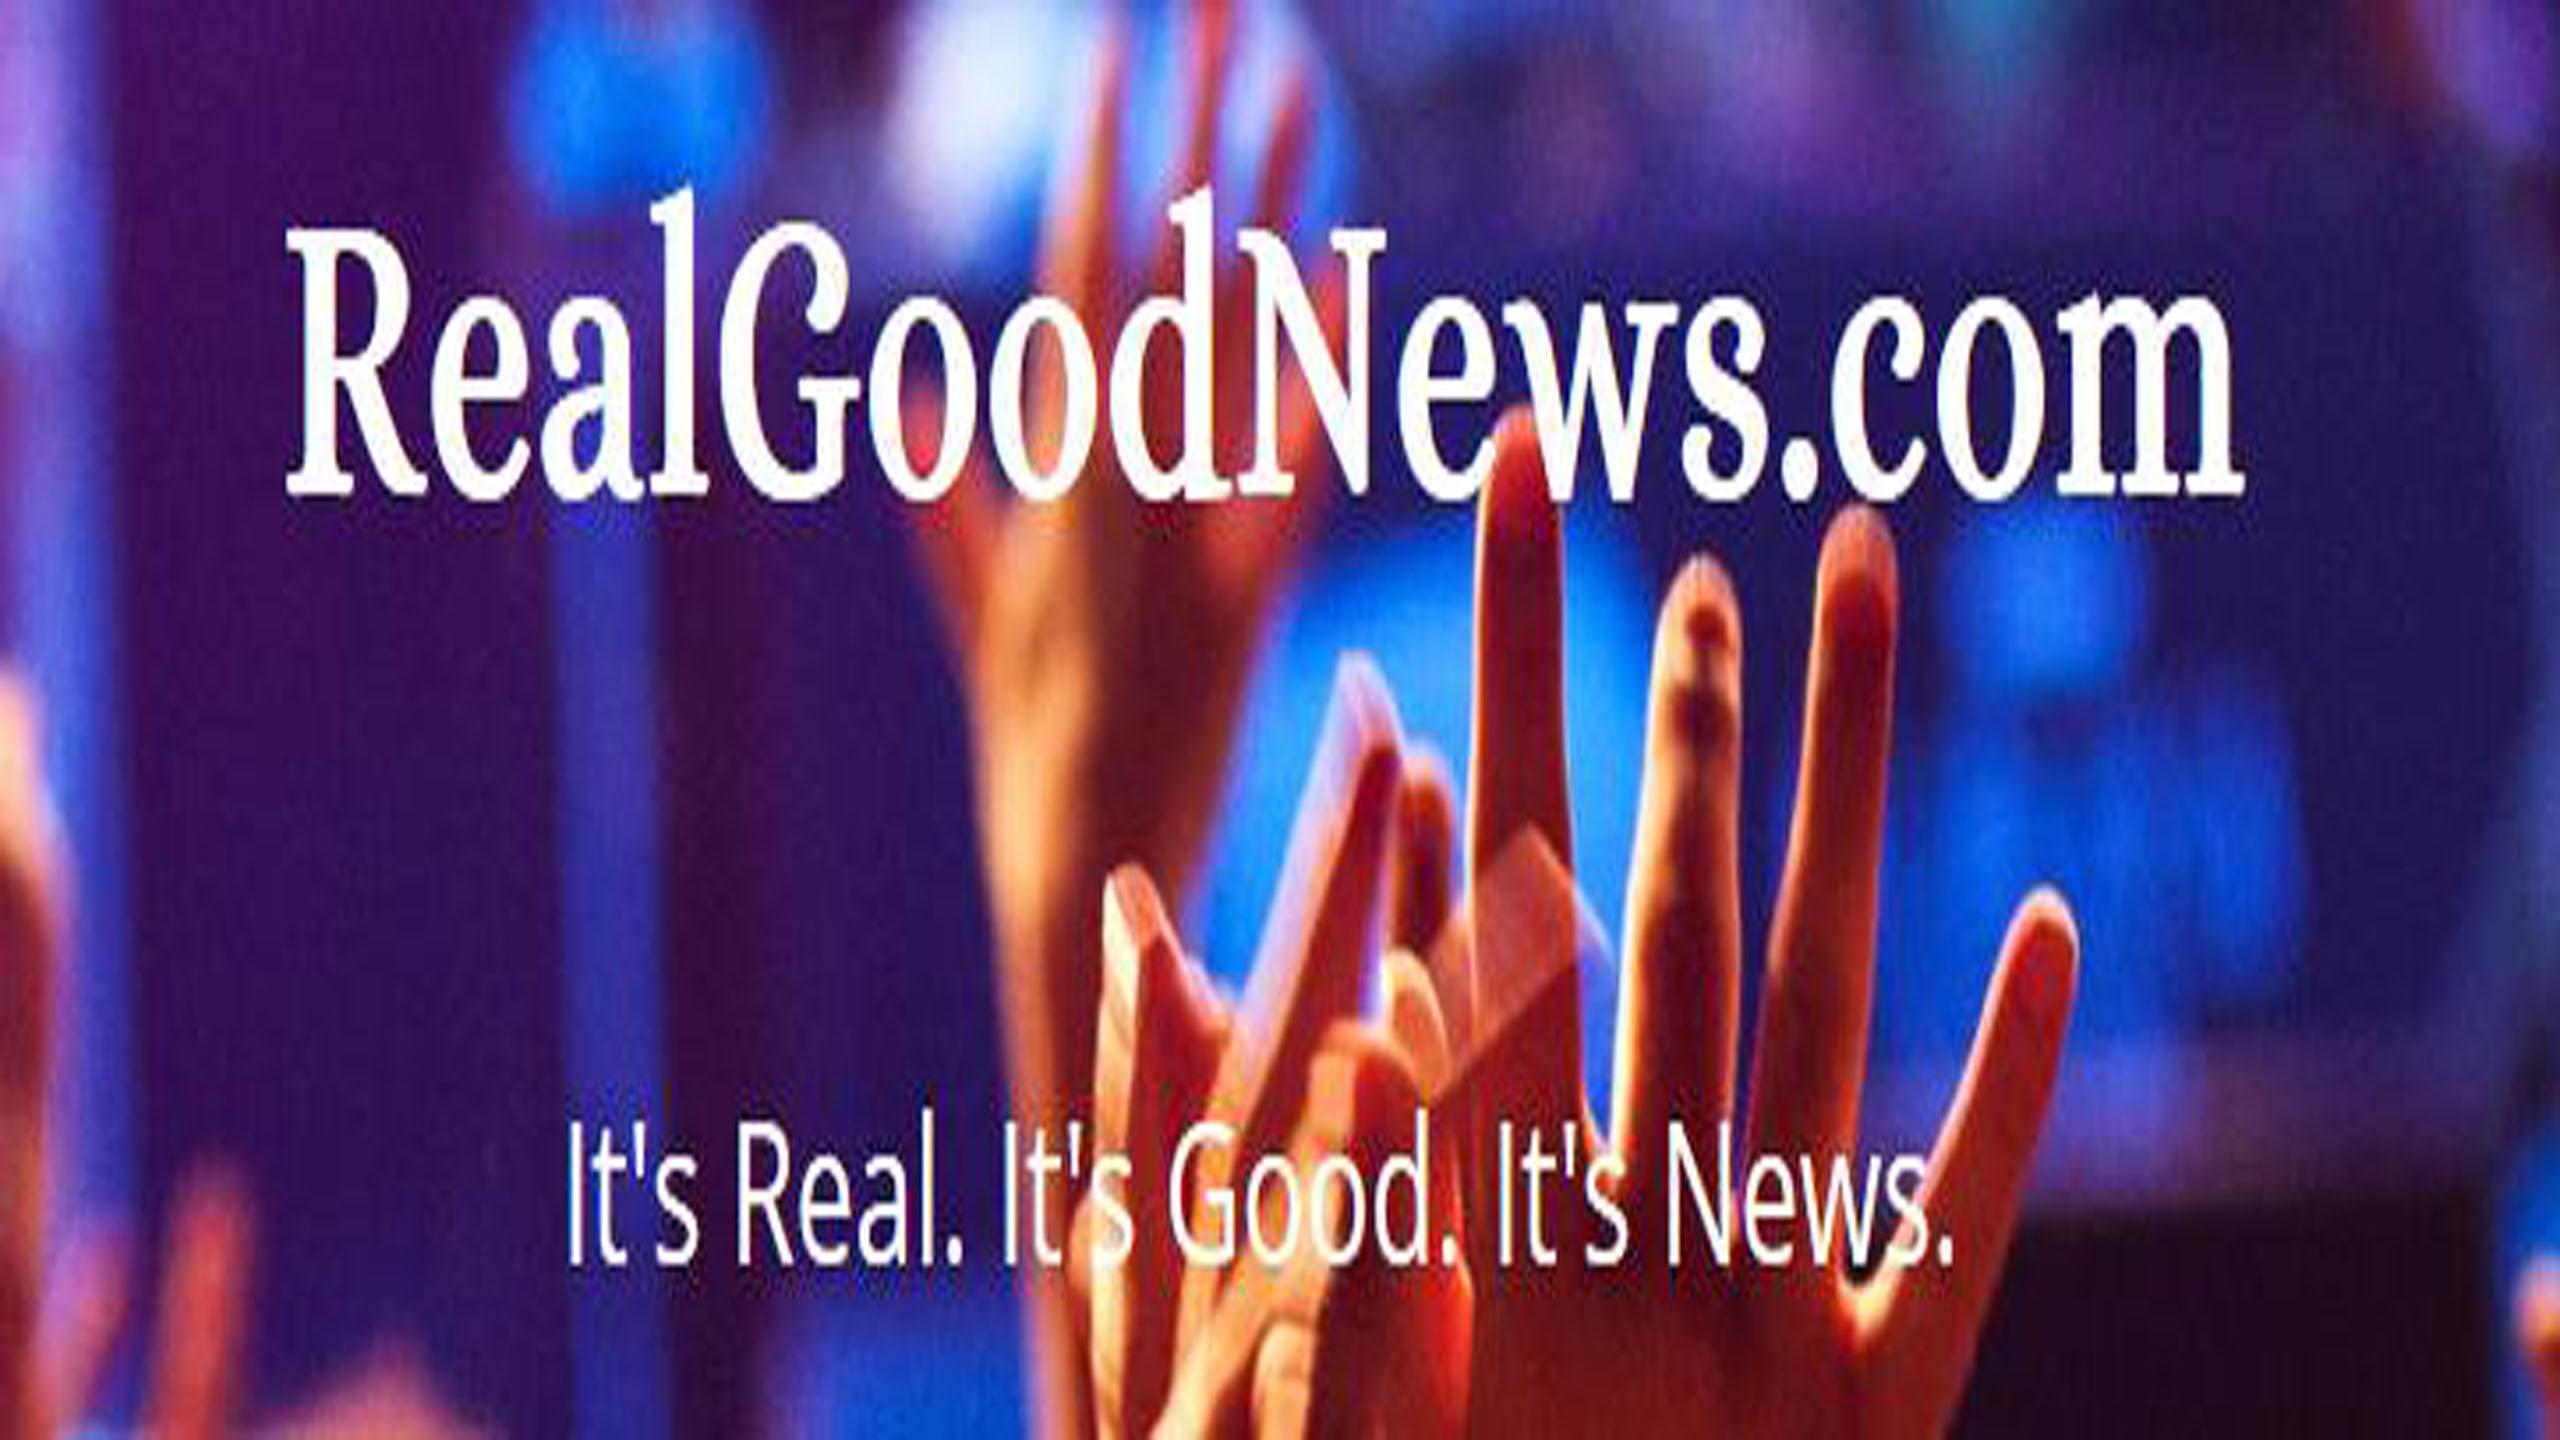 RealGoodNews with dotcom banner photo